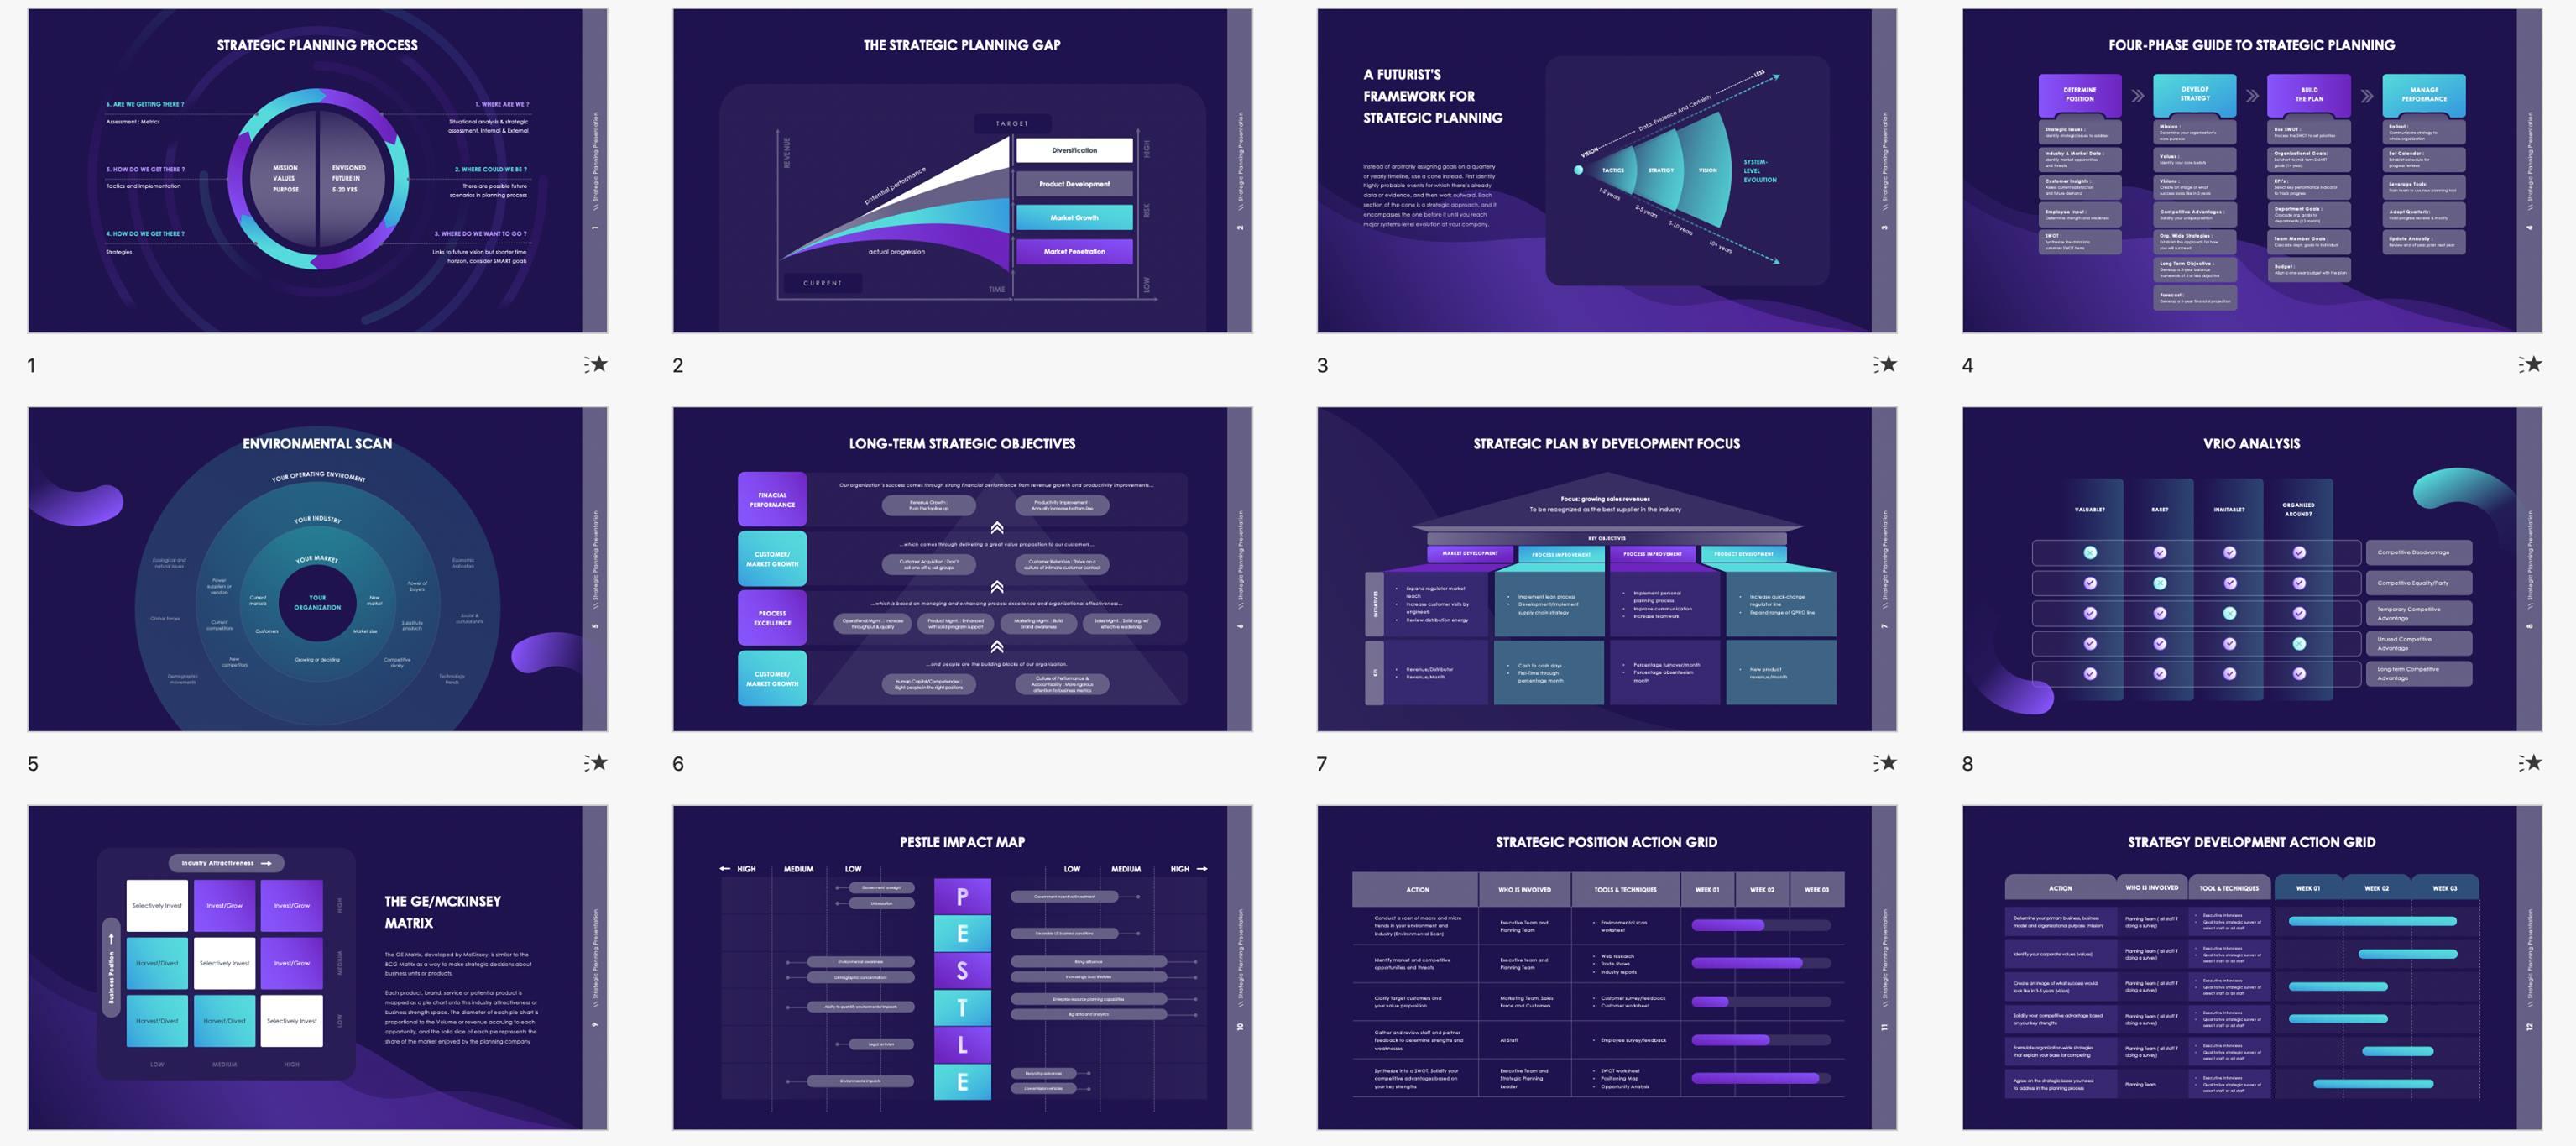 Strategic Planning Presentation in PowerPoint,  Google Slides,  and Keynote